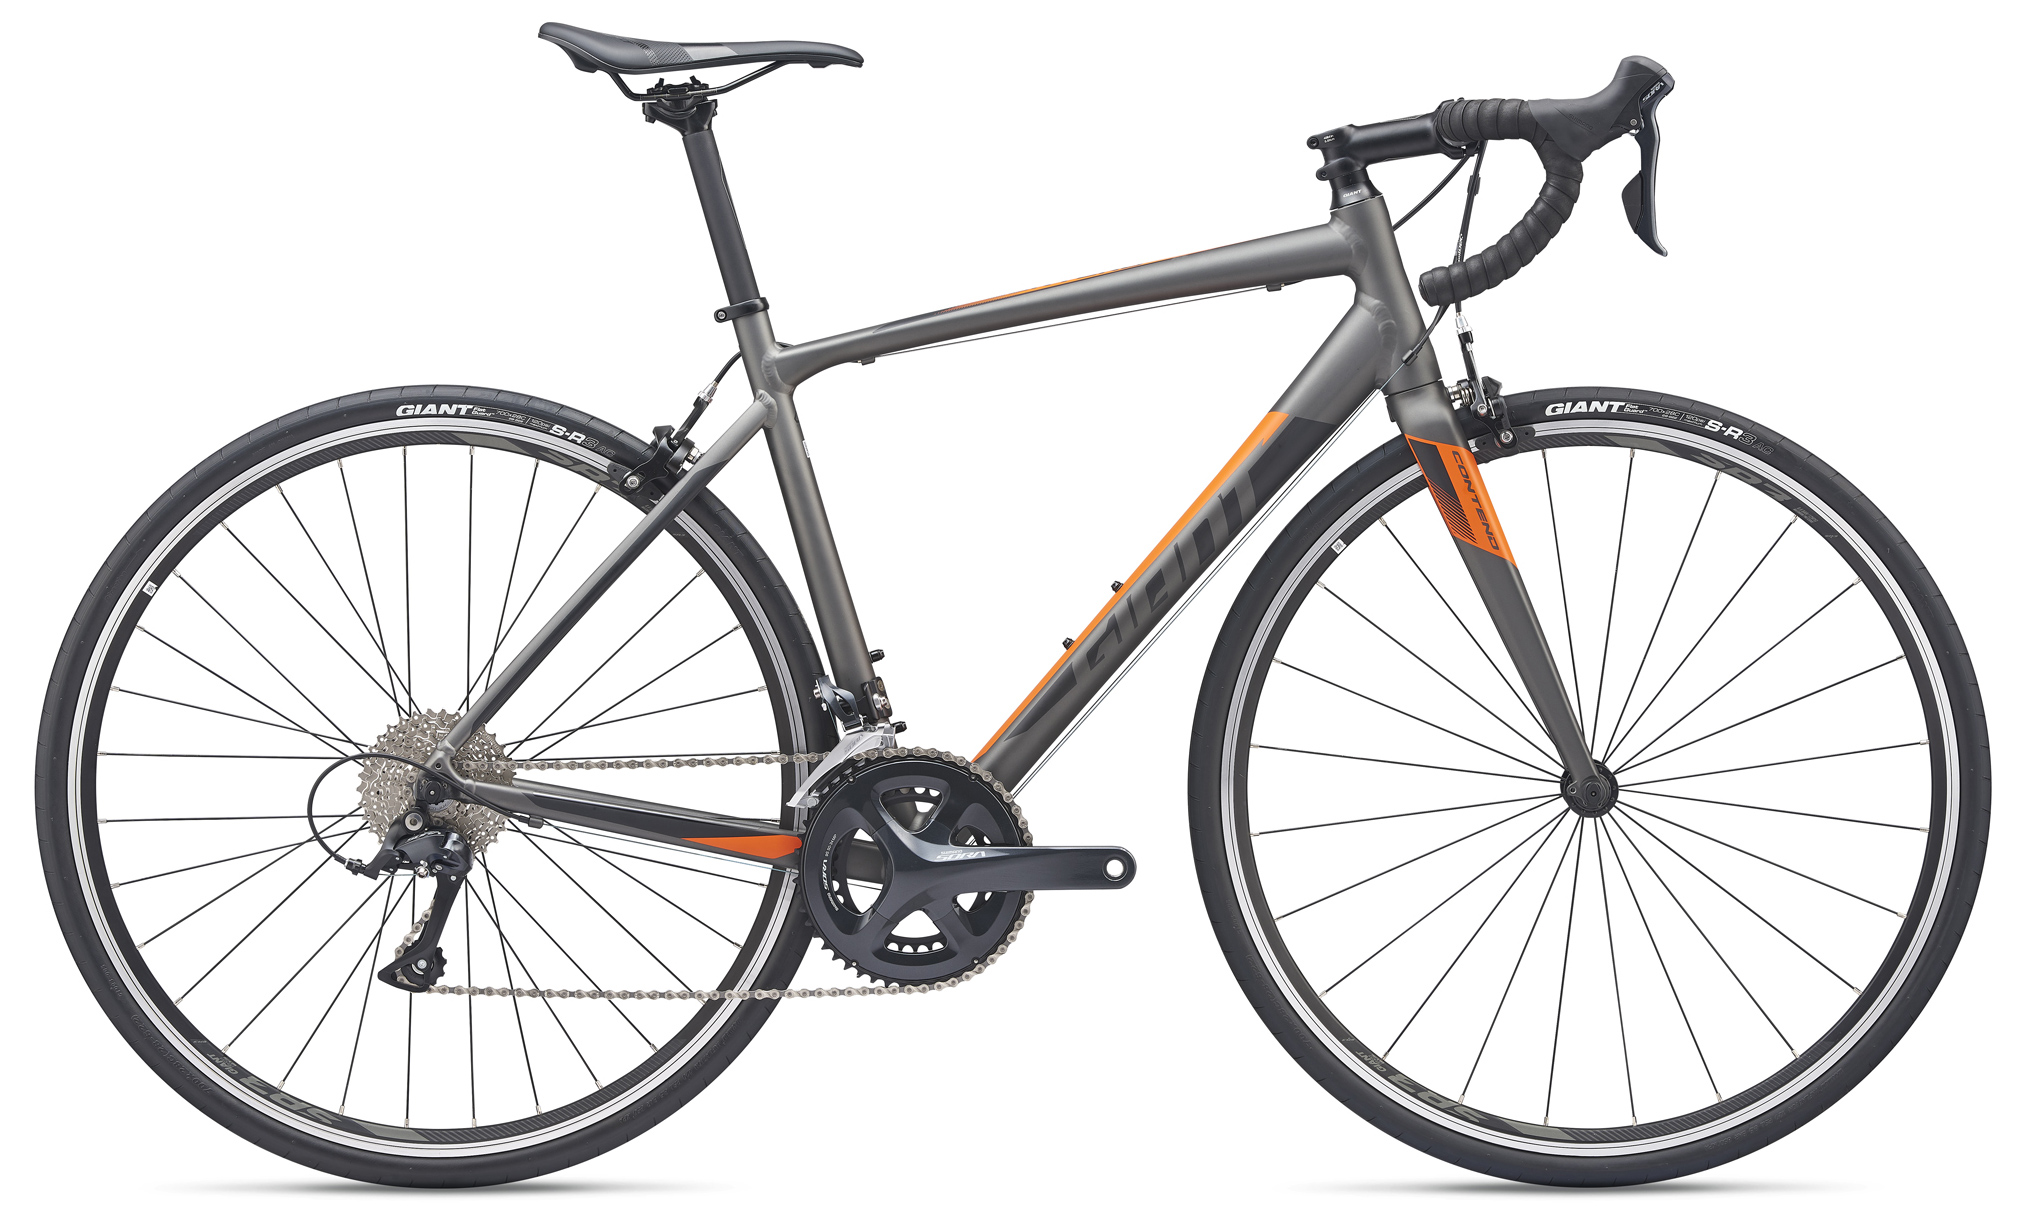 Велосипед Giant Contend 1 2019 велосипед giant toughroad slr 1 2018